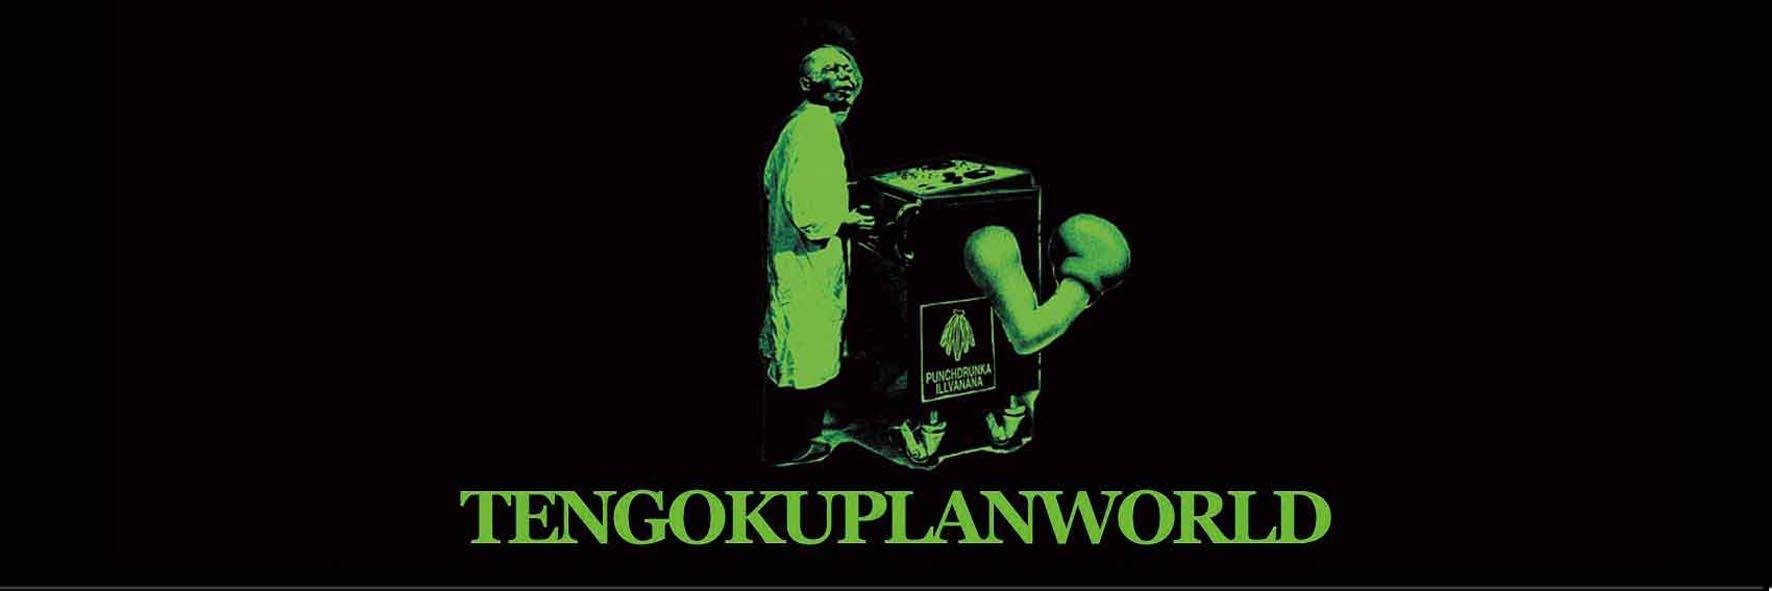 TENGOKU PLAN WORLD ONLINE SHOP